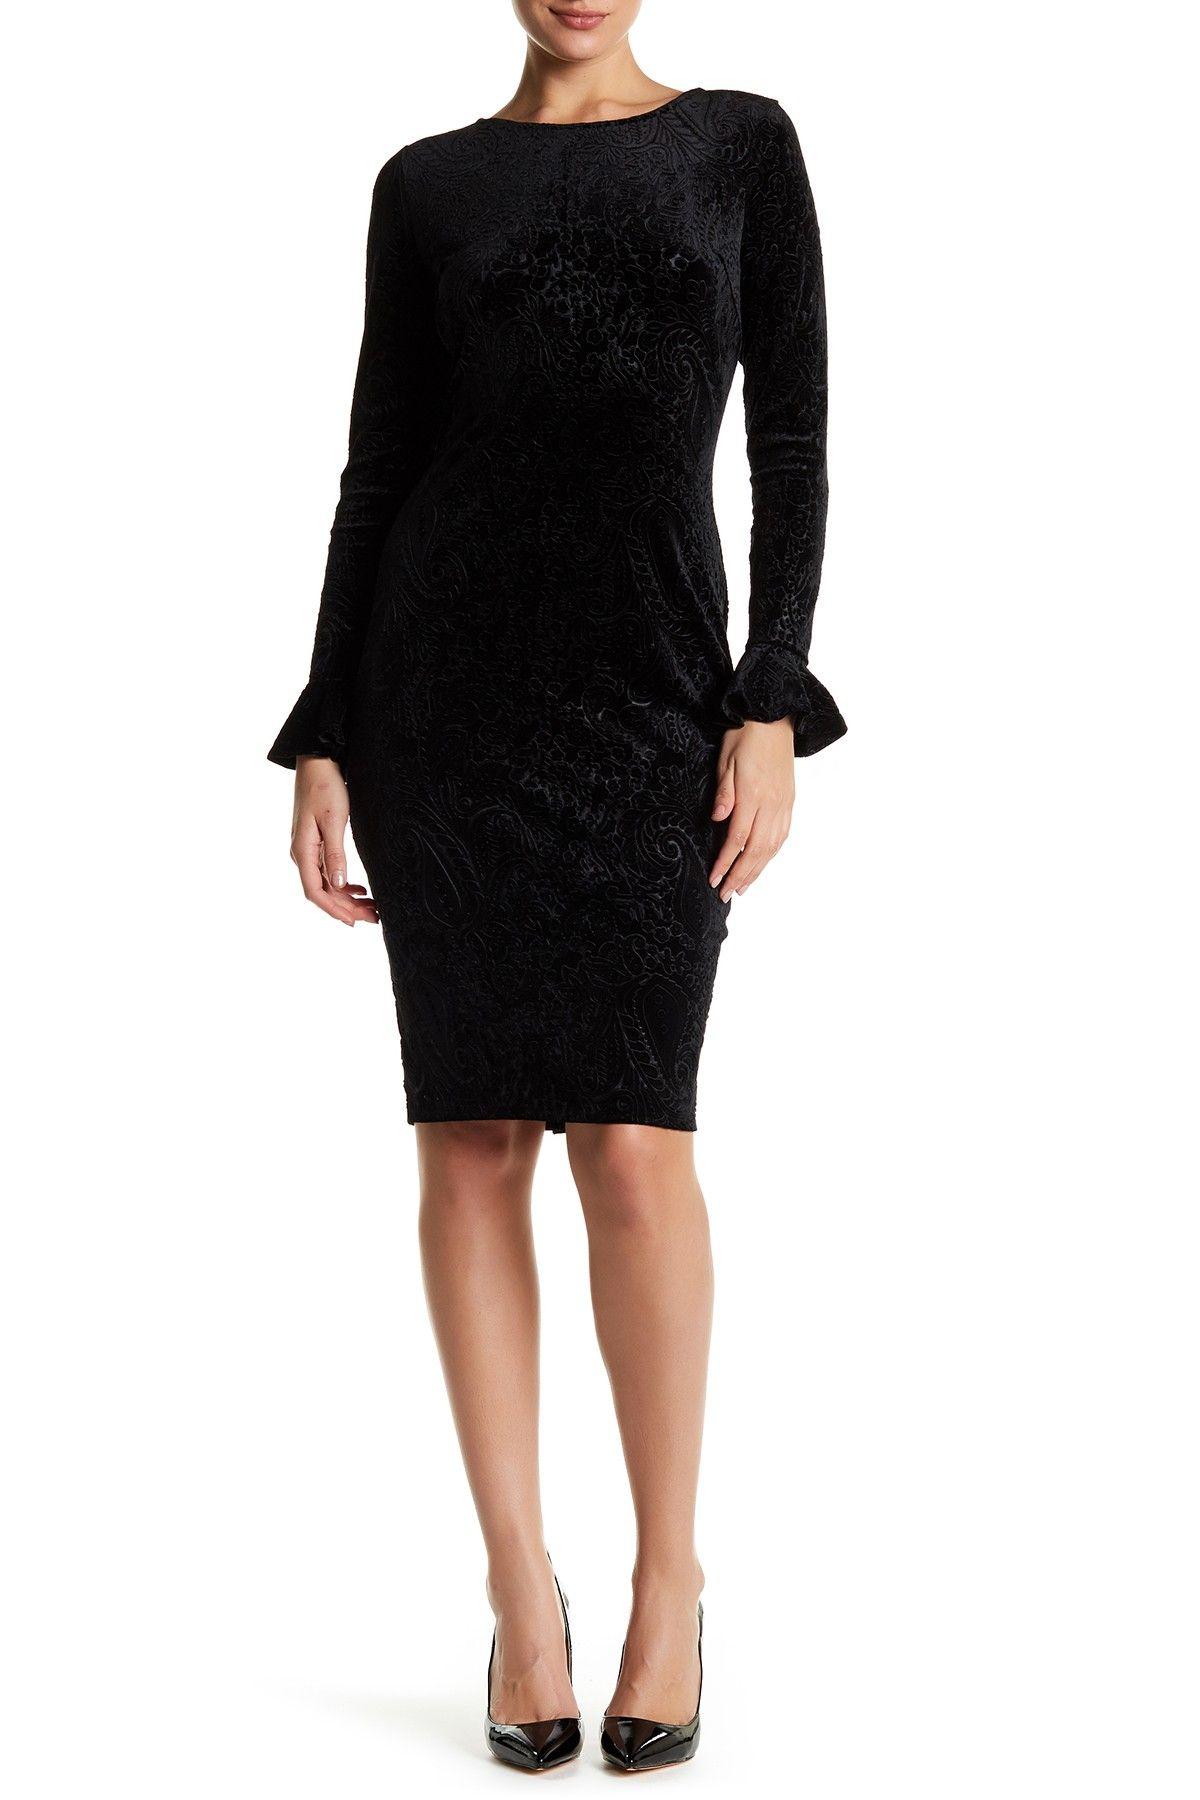 8d48659414a0 Velvet Bell Sleeve Bodycon Dress by Alexia Admor on @HauteLook ...